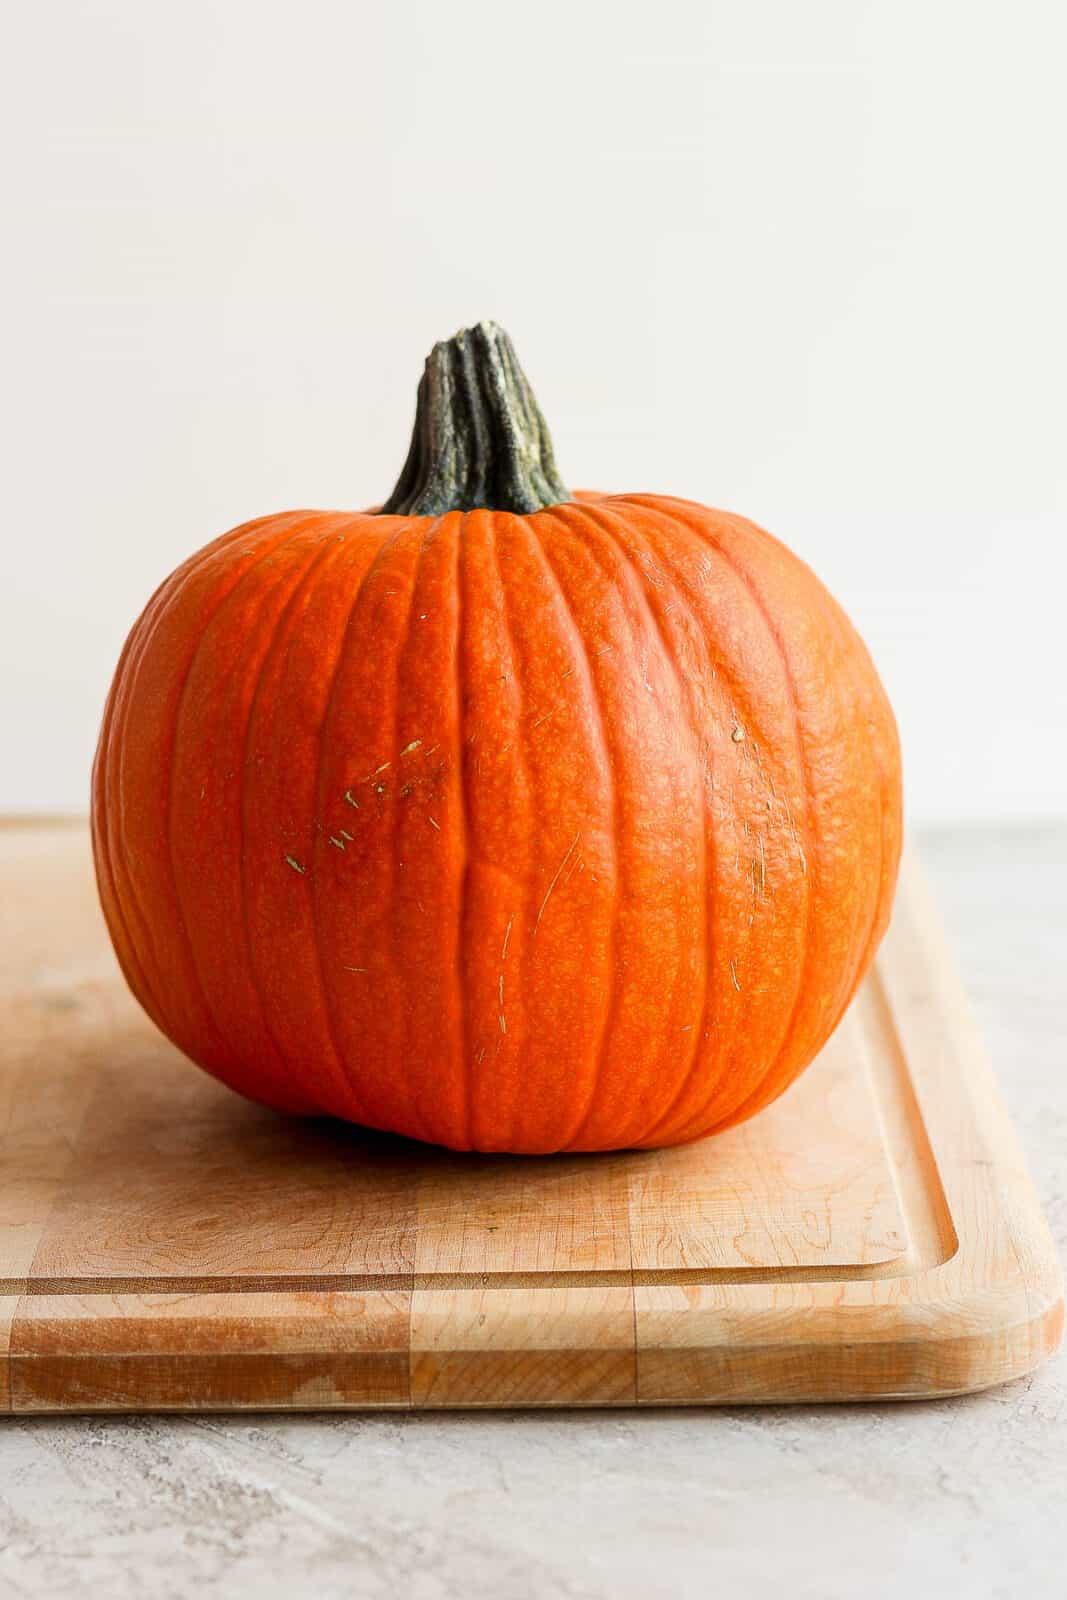 A small, baking pumpkin on a cutting board.